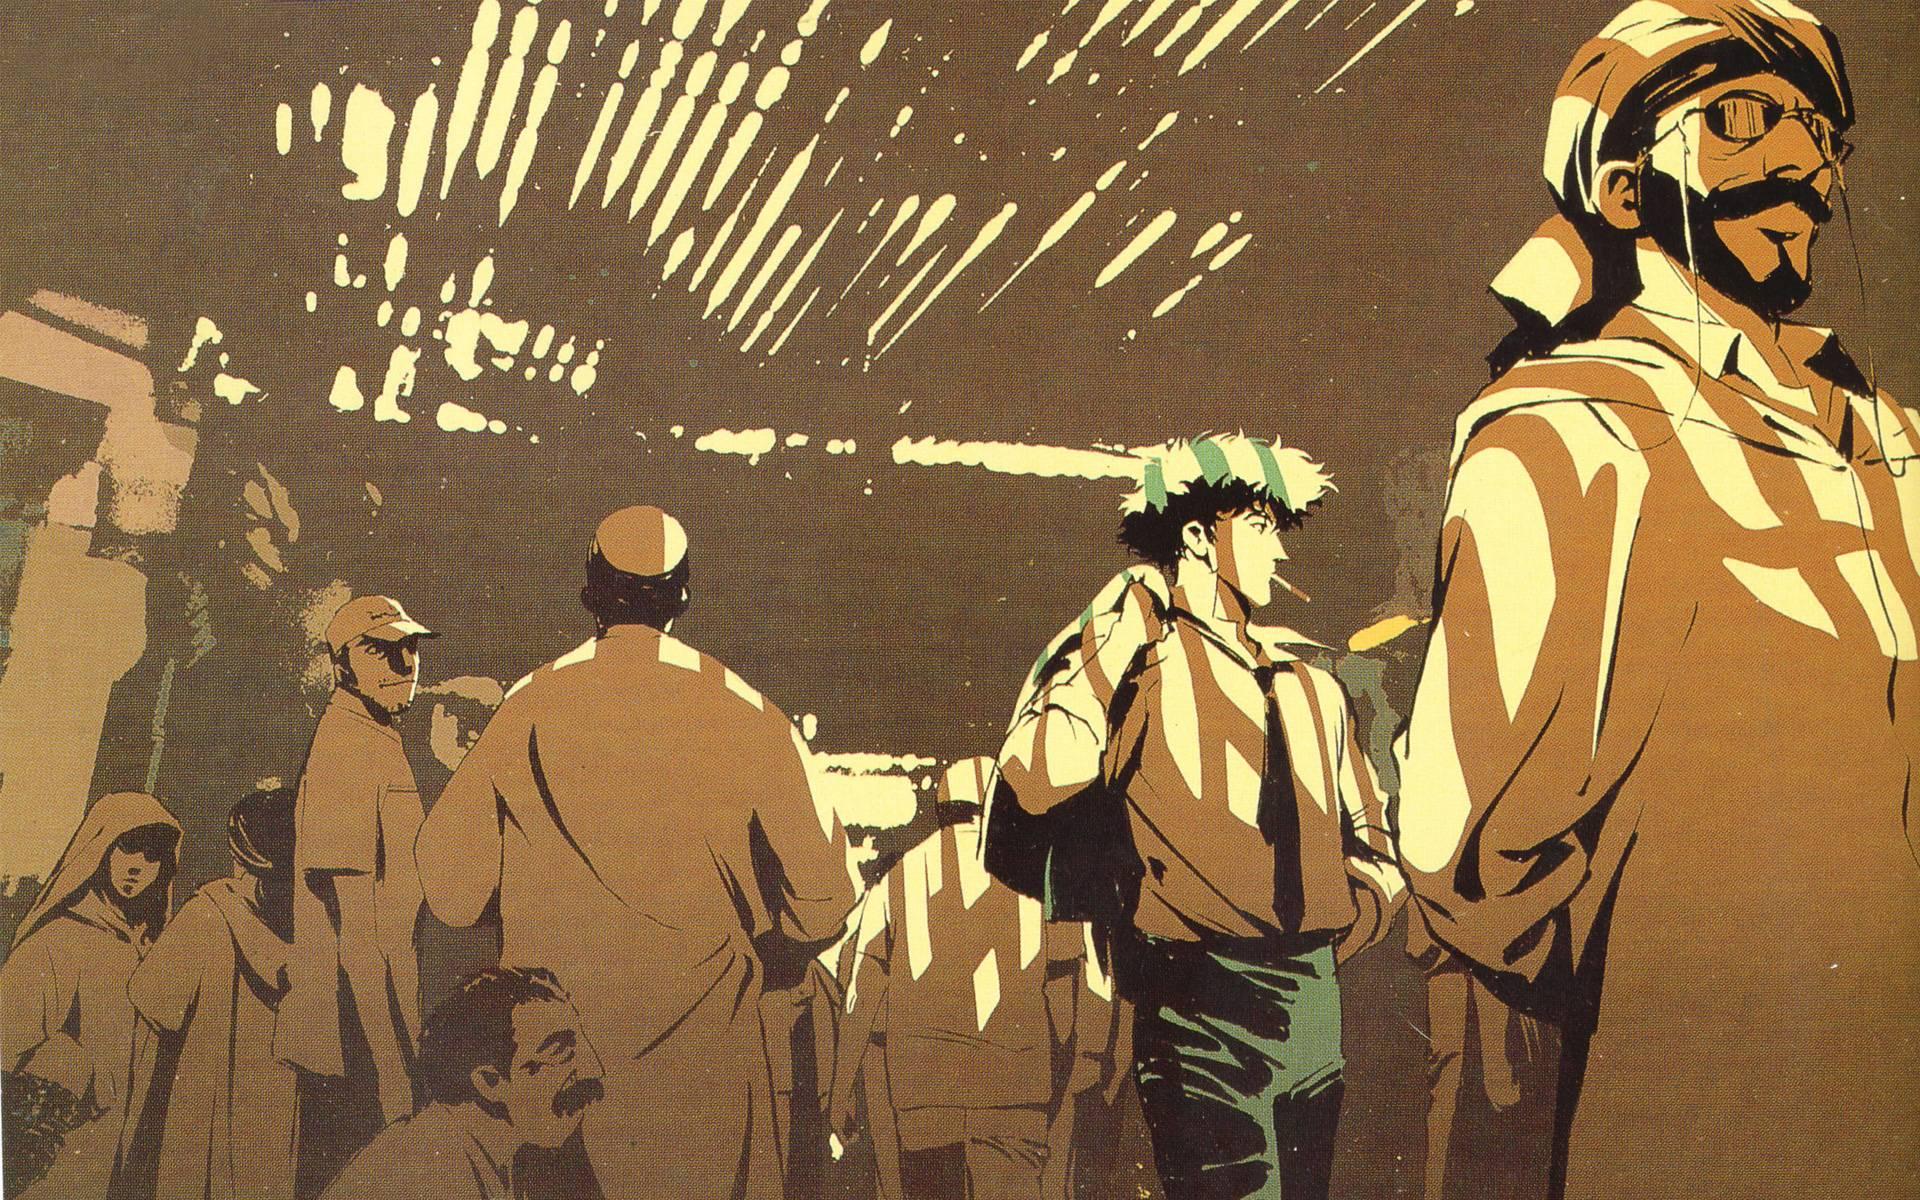 Cowboy Bebop Wallpapers - Wallpaper Cave